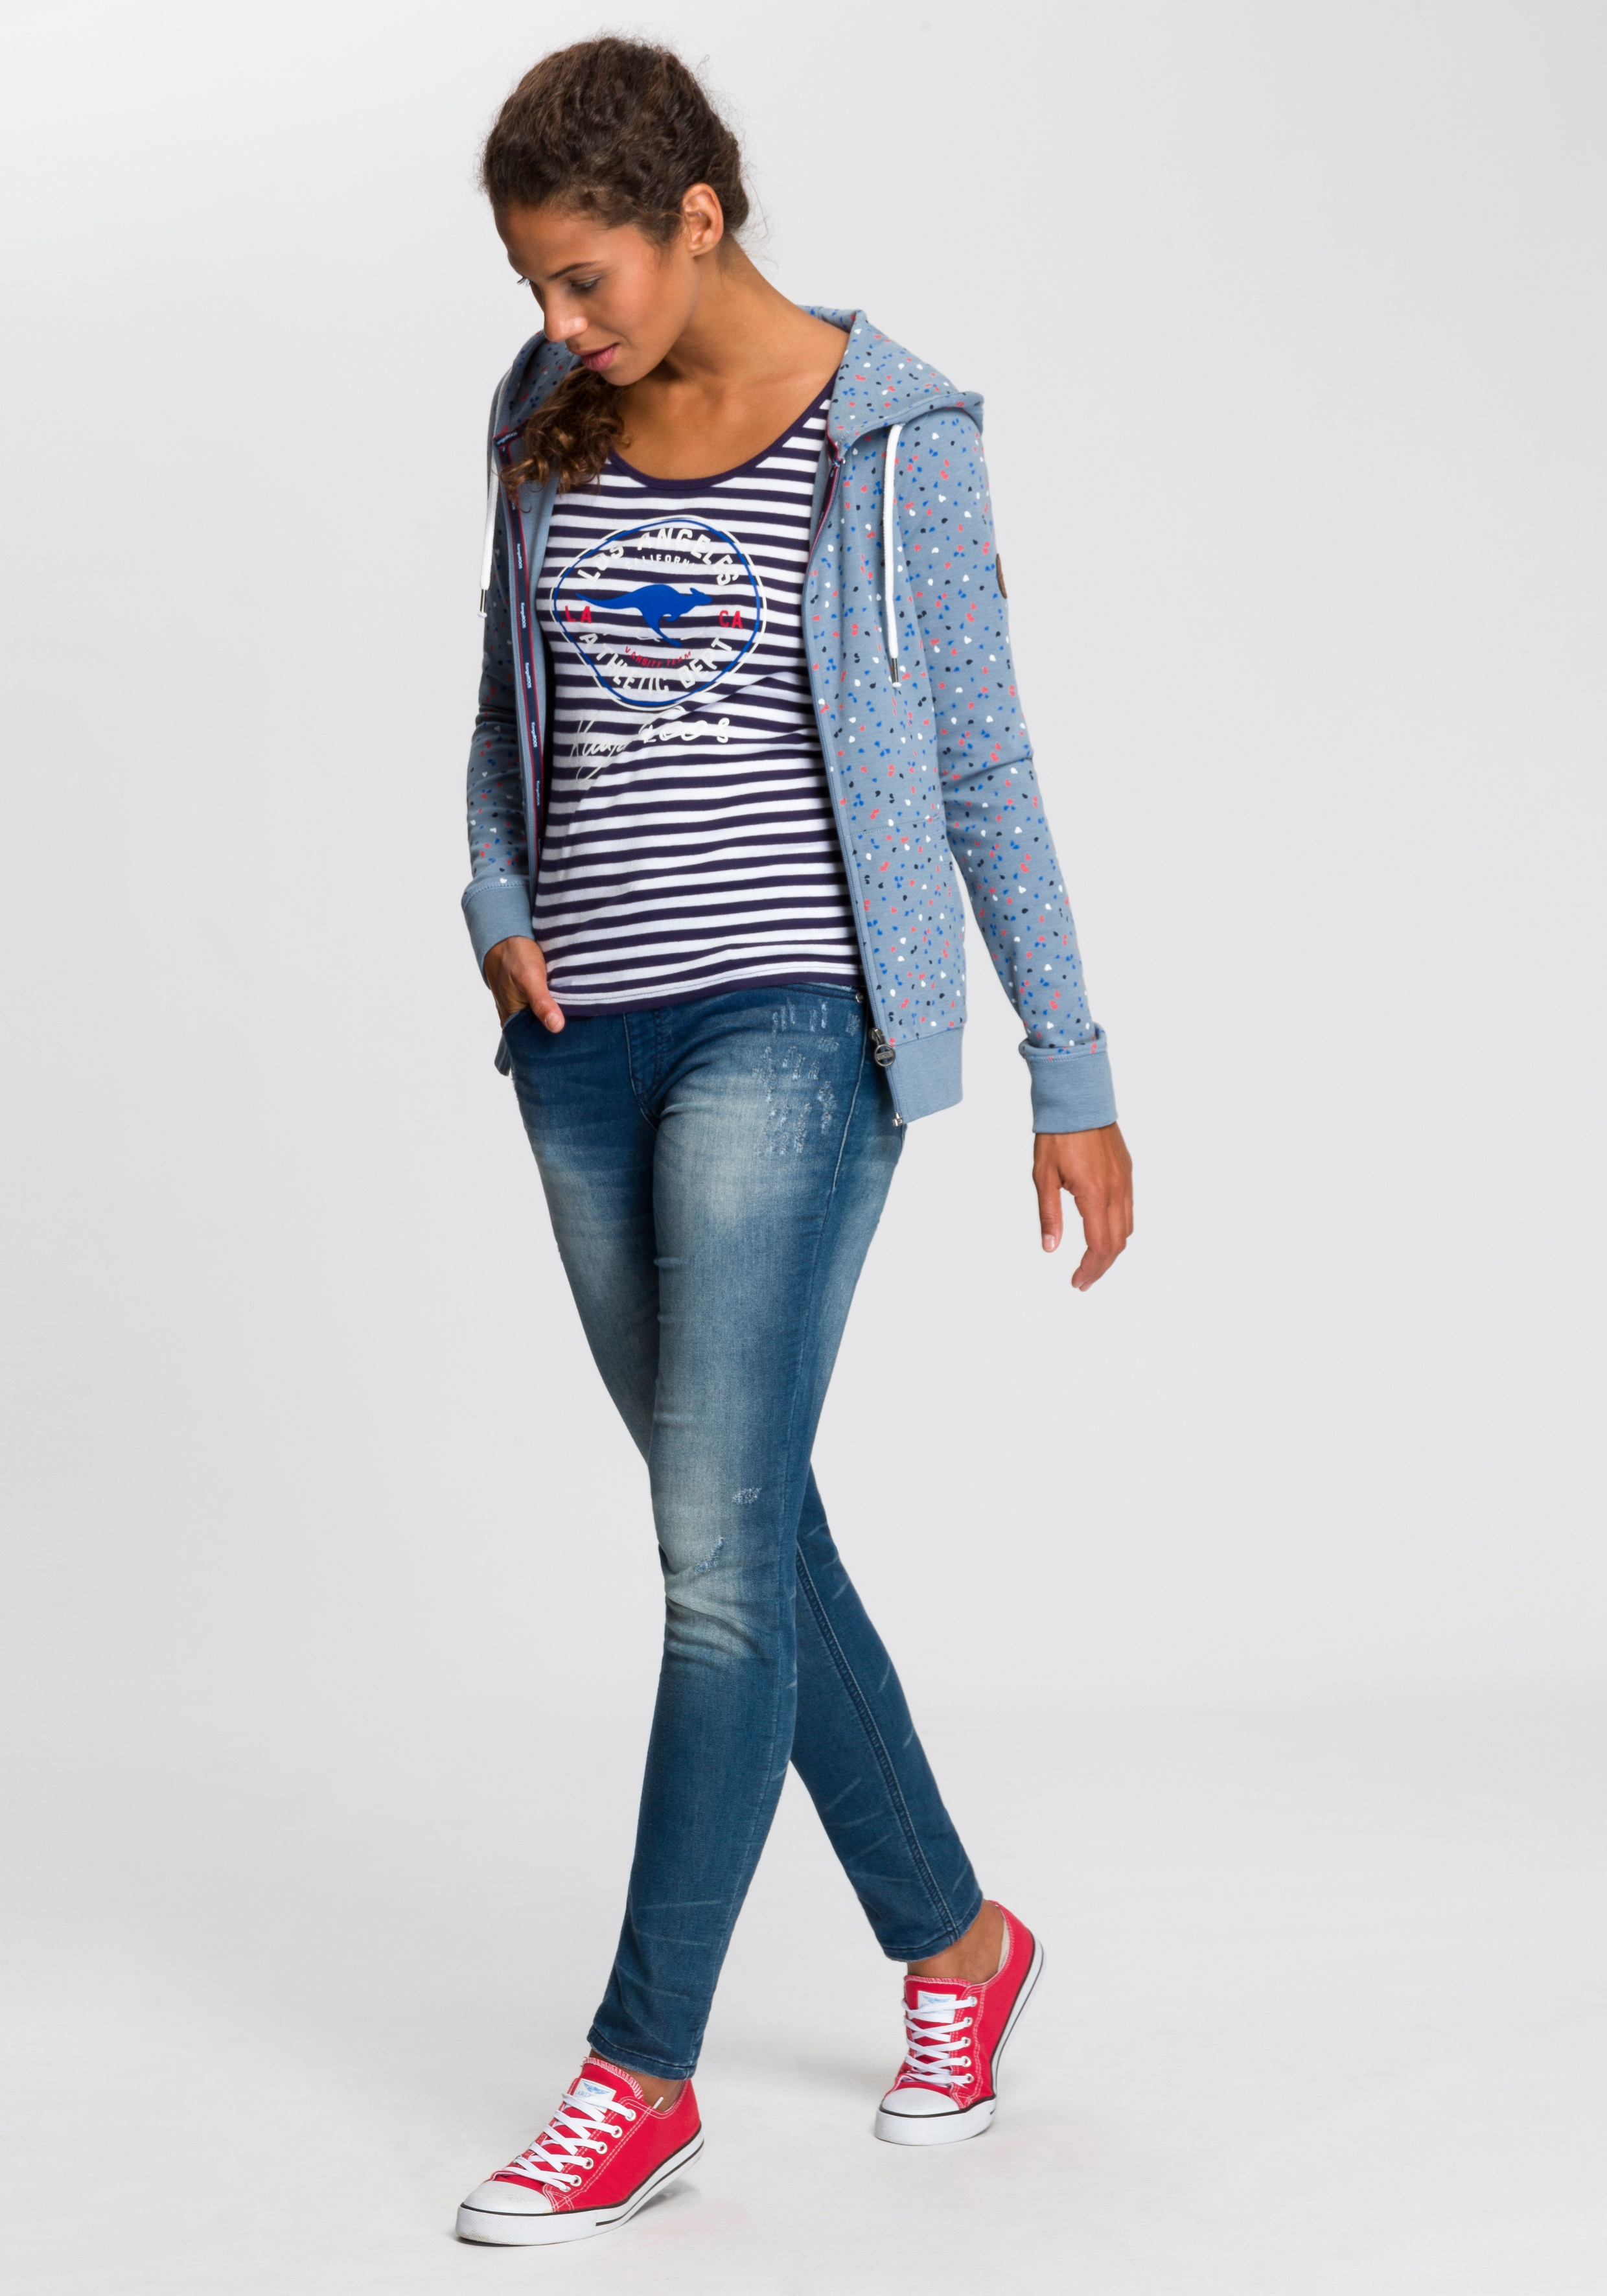 KangaROOS Kapuzensweatjacke mit sportlichem Minimal-Print Damen Sweatjacken